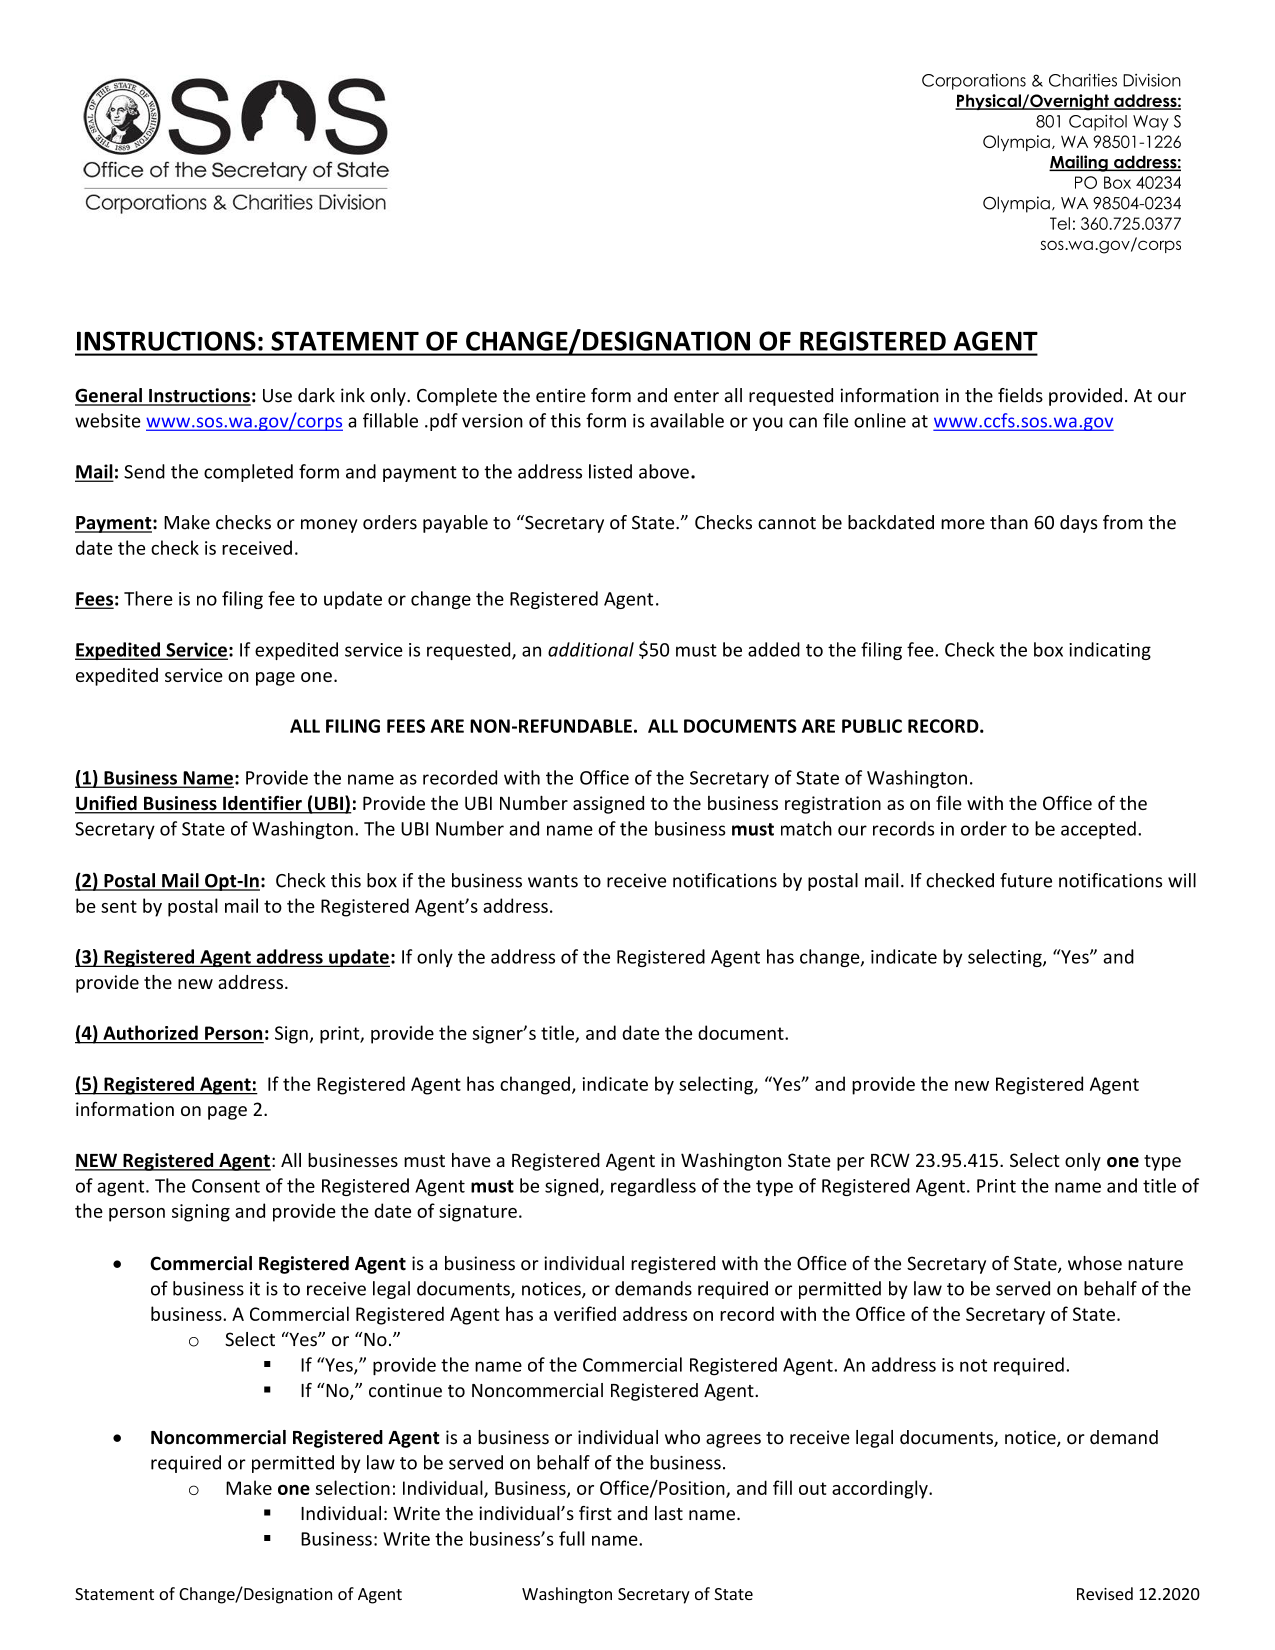 washington-statement-of-change-for-registered-agent